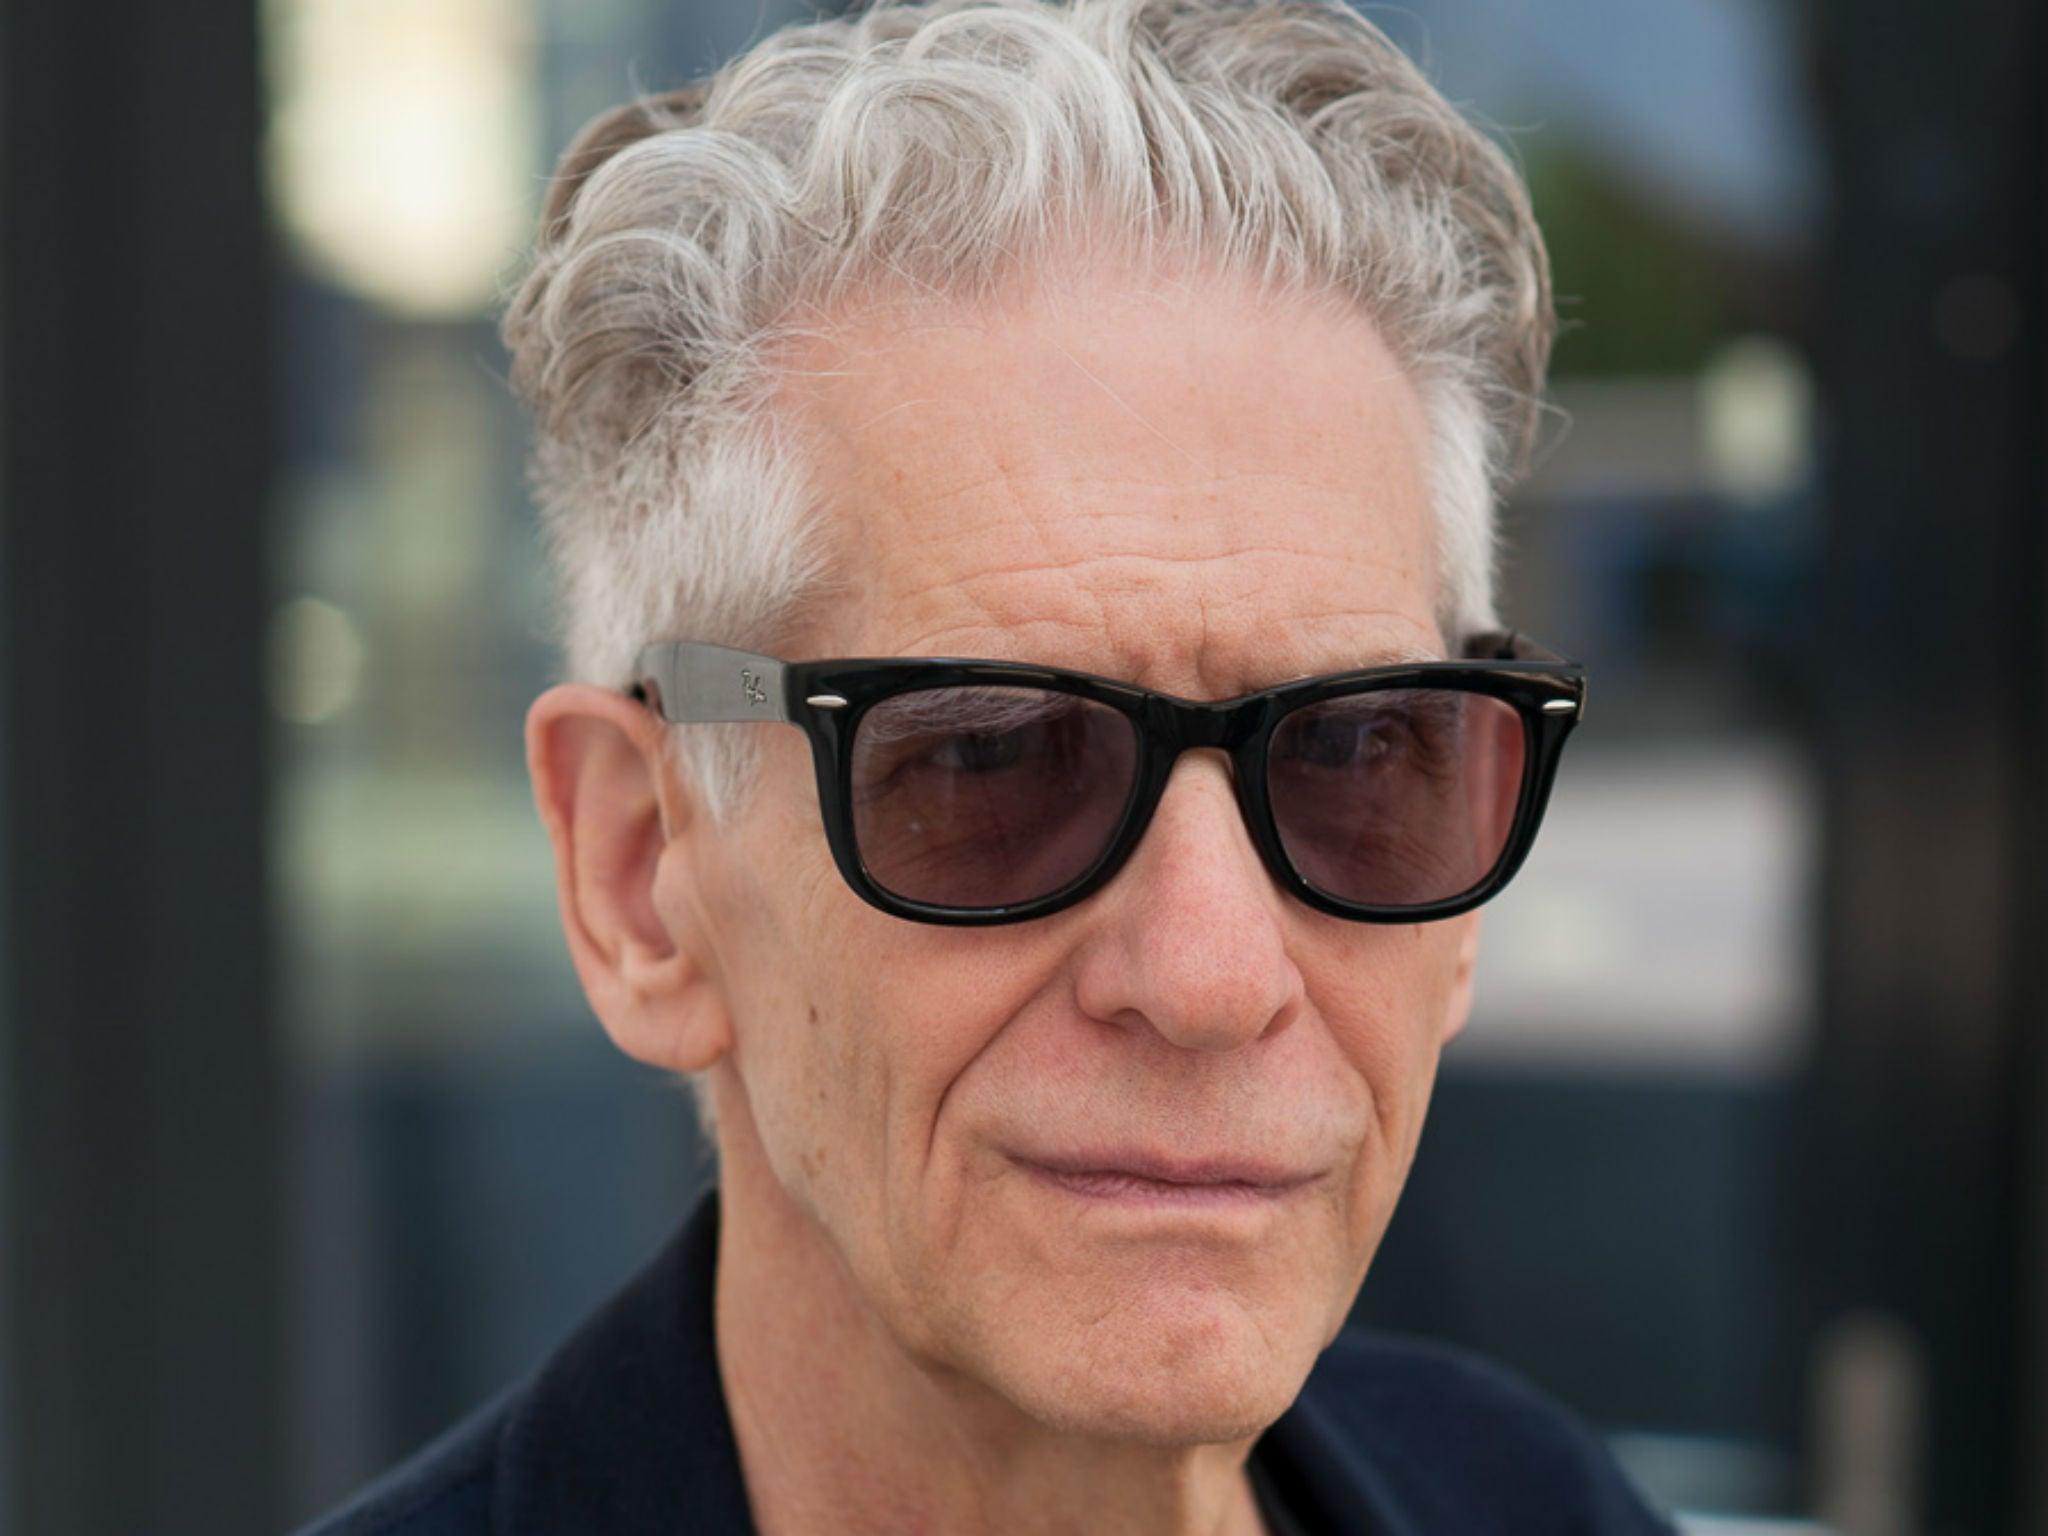 David Cronenberg - film director, screenwriter. The best films of David Cronenberg 92